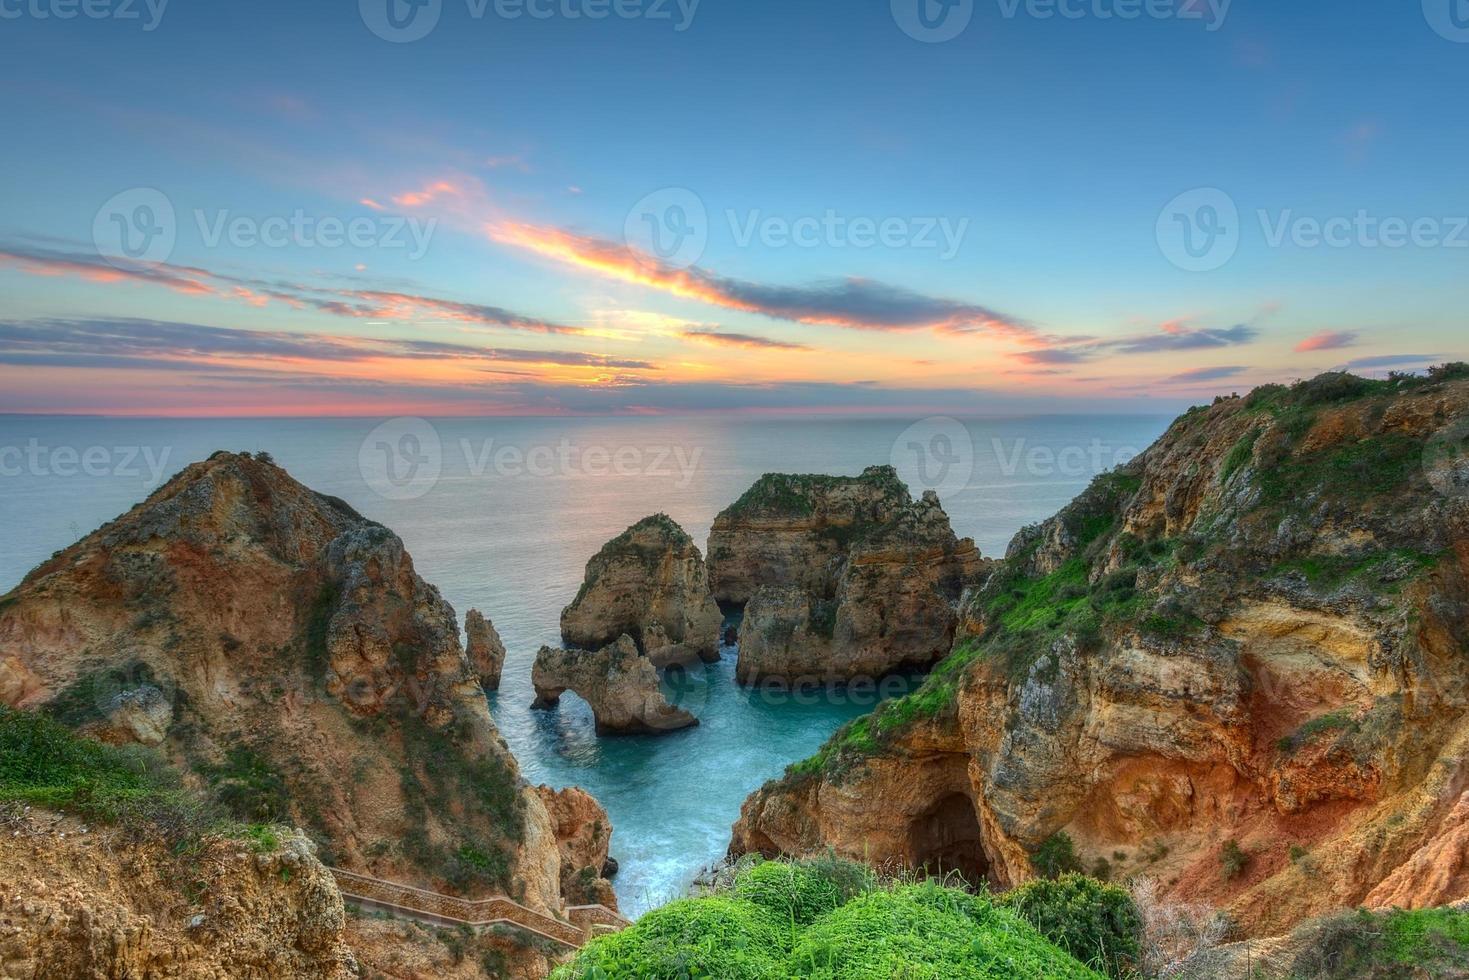 vackra havslandskap soluppgång. lagos, portugal, algarve. foto